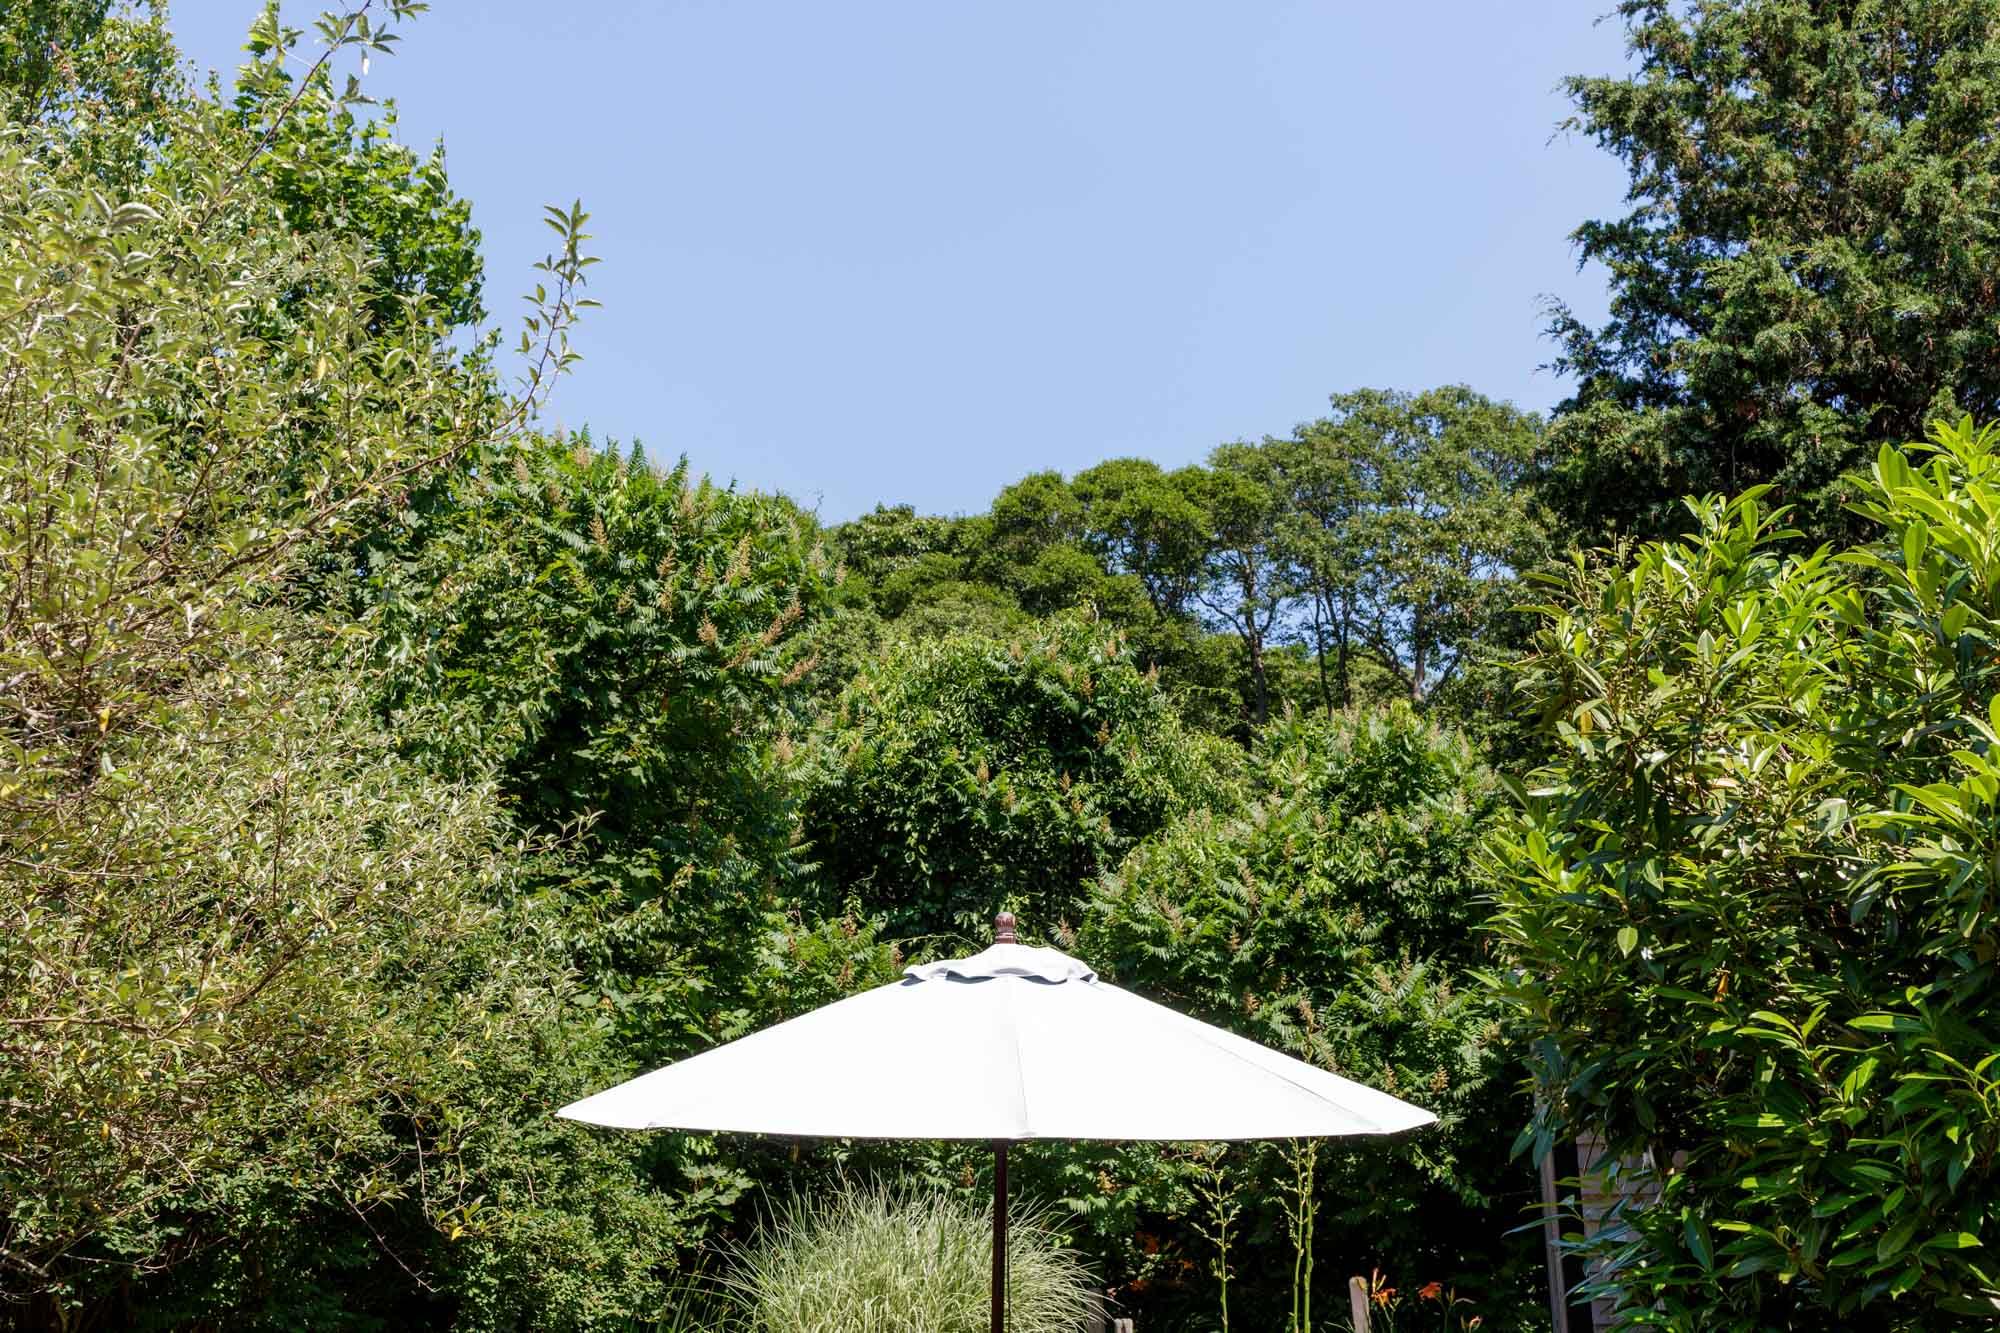 Sun Umbrella and Trees